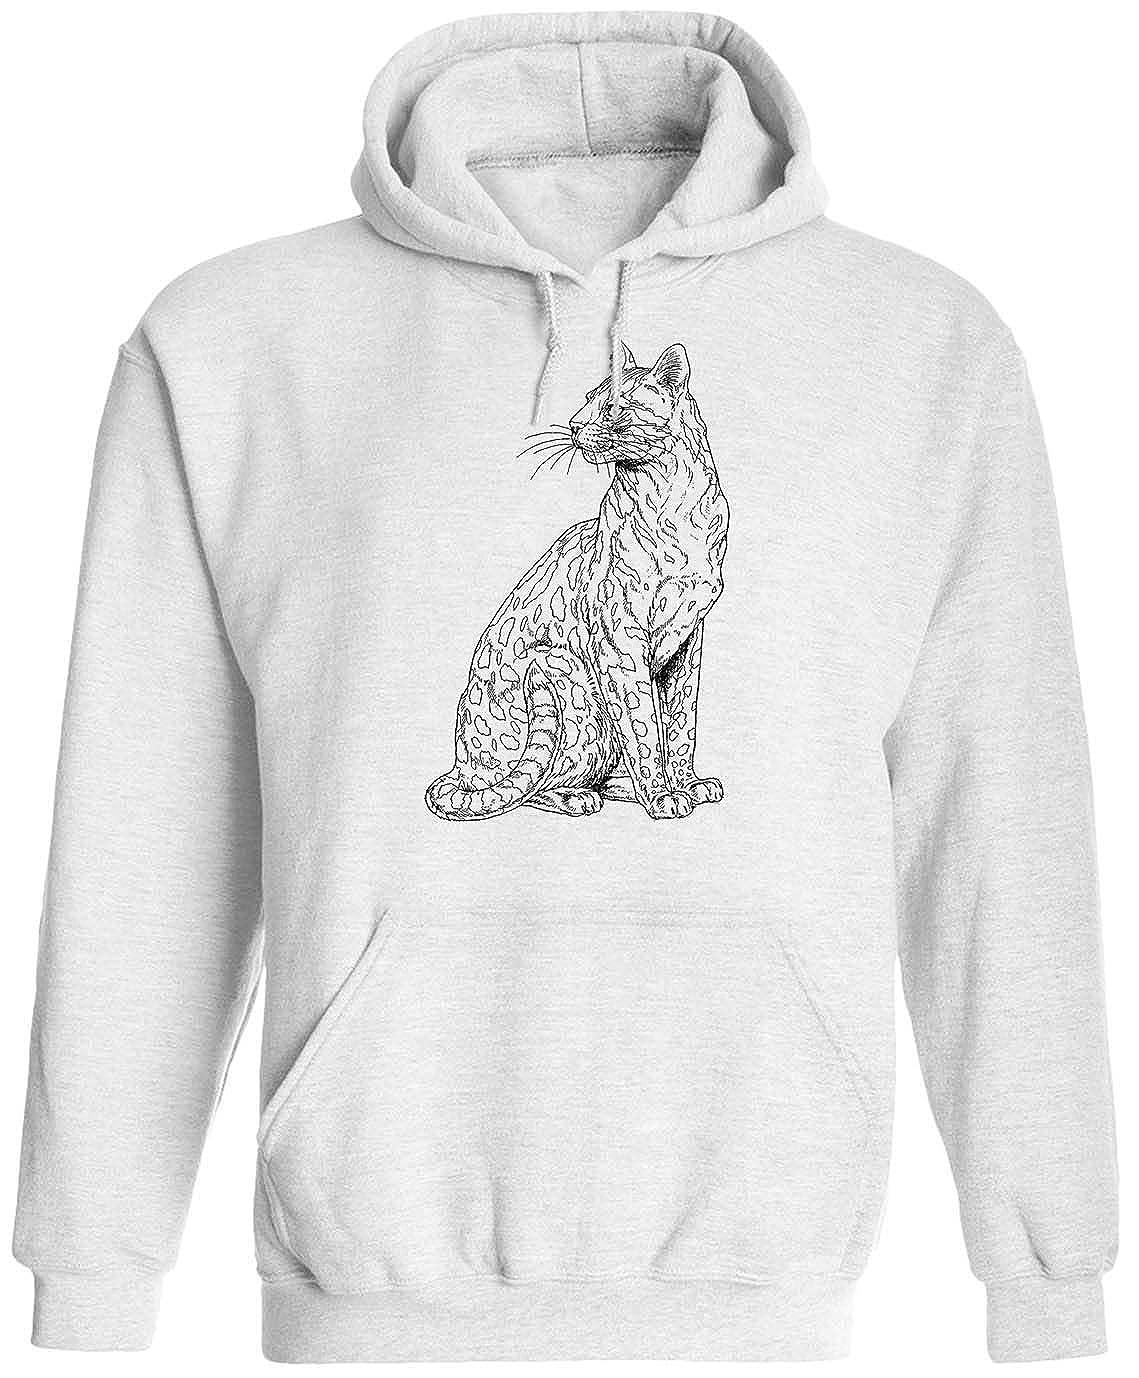 Beautiful Cheetah Unisex Adult Hooded Pullover Sweatshirt